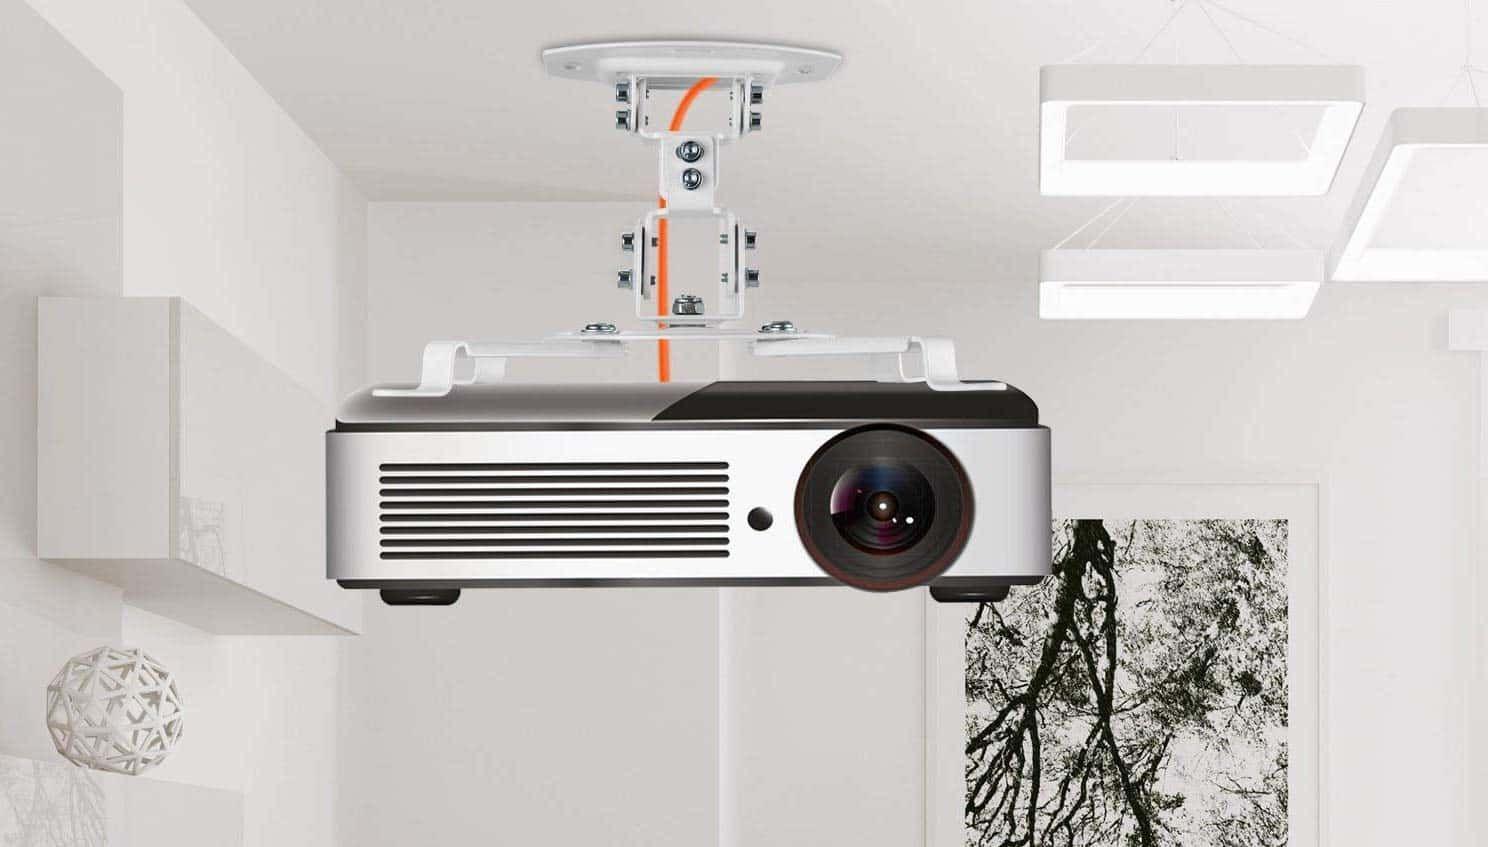 Top 10 Best Projector Ceiling Mounts In 2020 Reviews Best